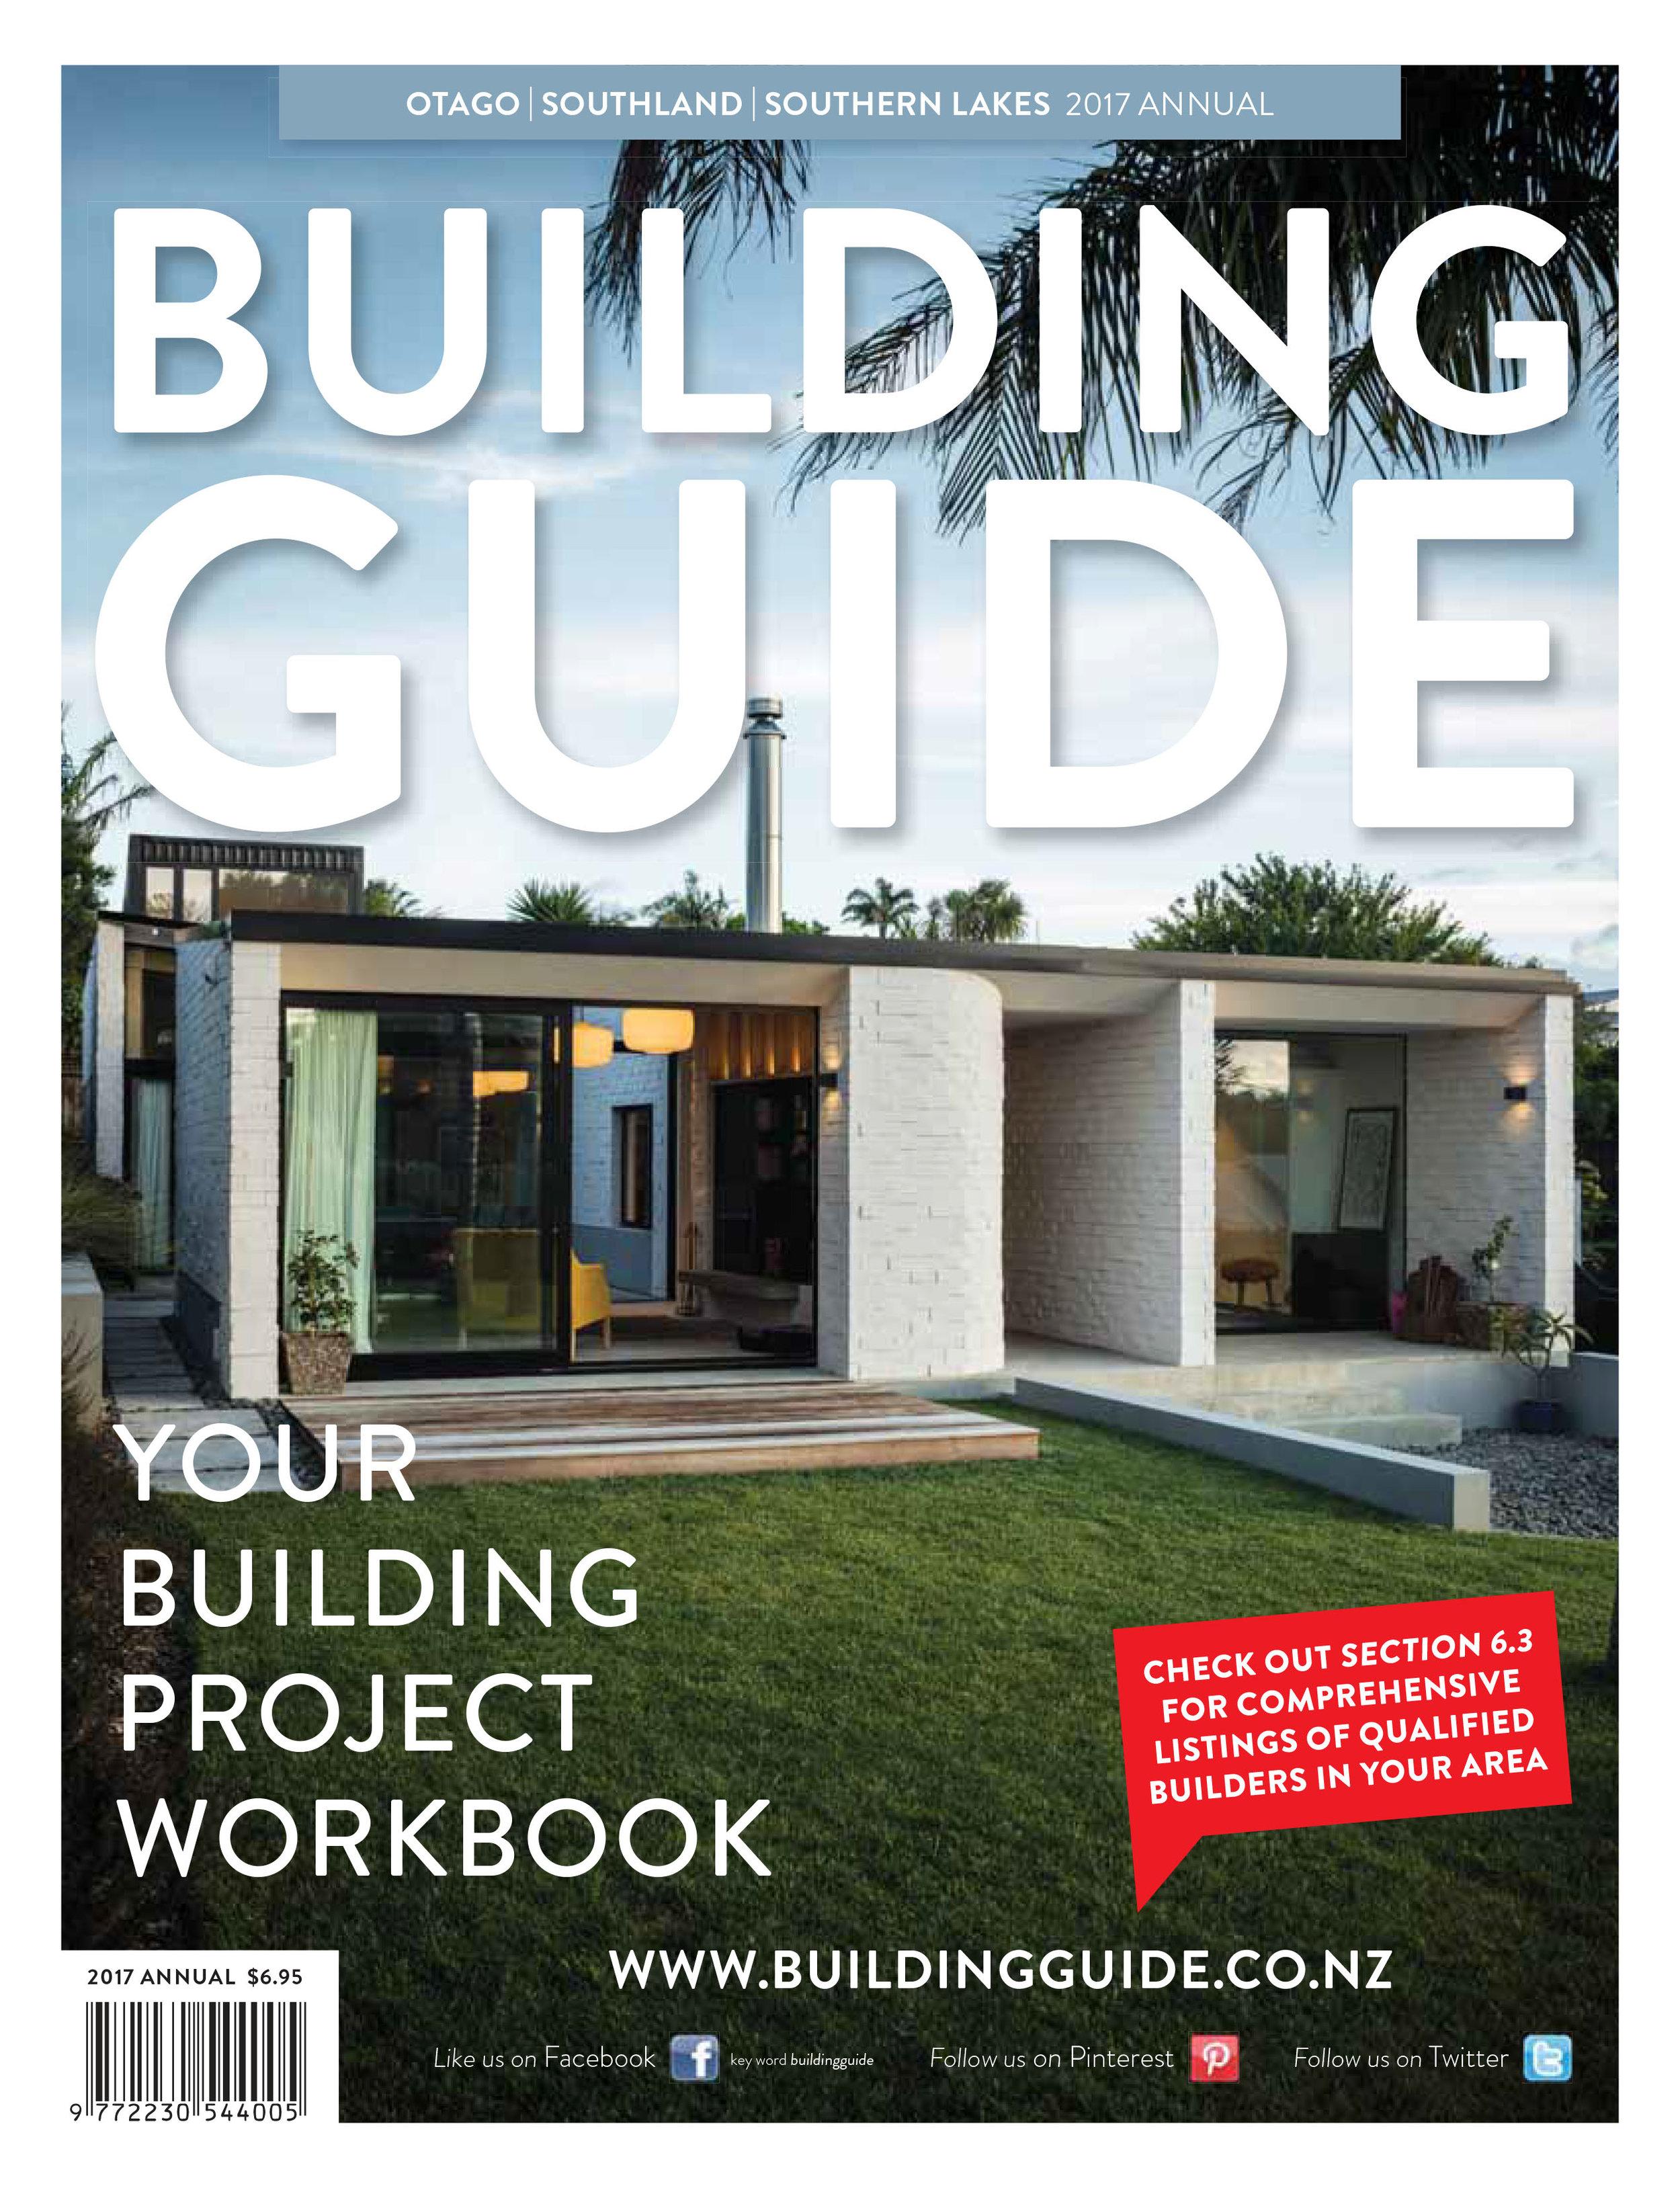 Otago-Southland-Building-Guide-2017-1.jpg